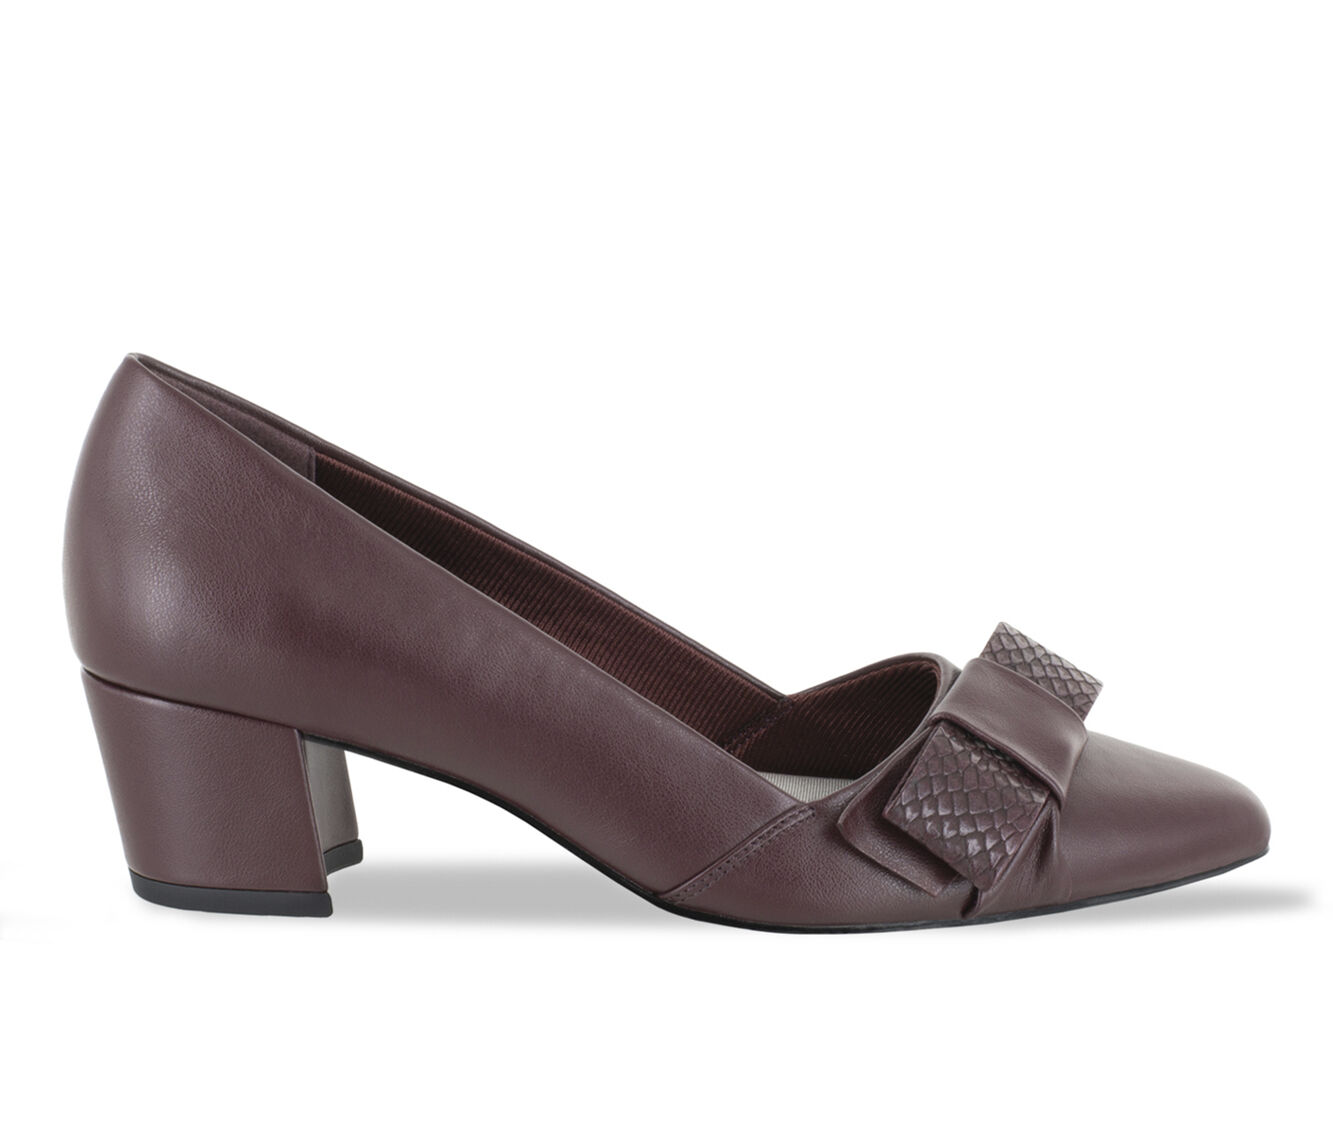 Fashionable Women's Easy Street Triana Shoes Burgundy